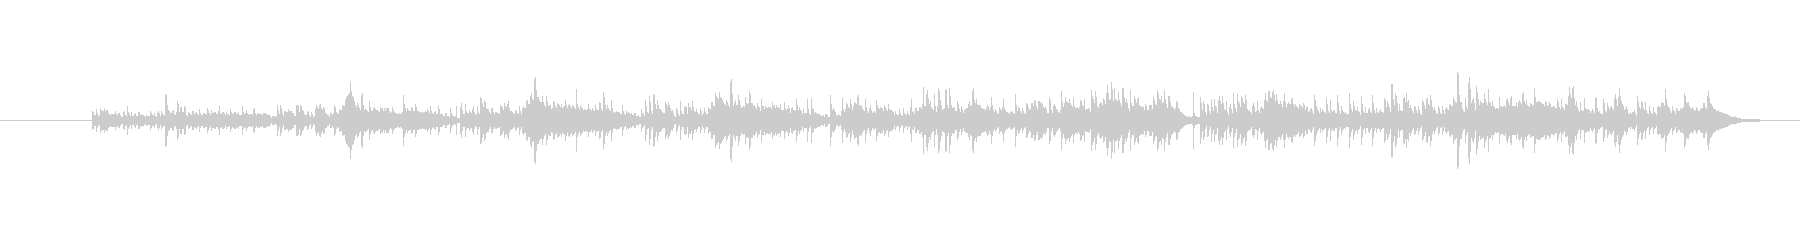 ma-ko song2の未再生の波形